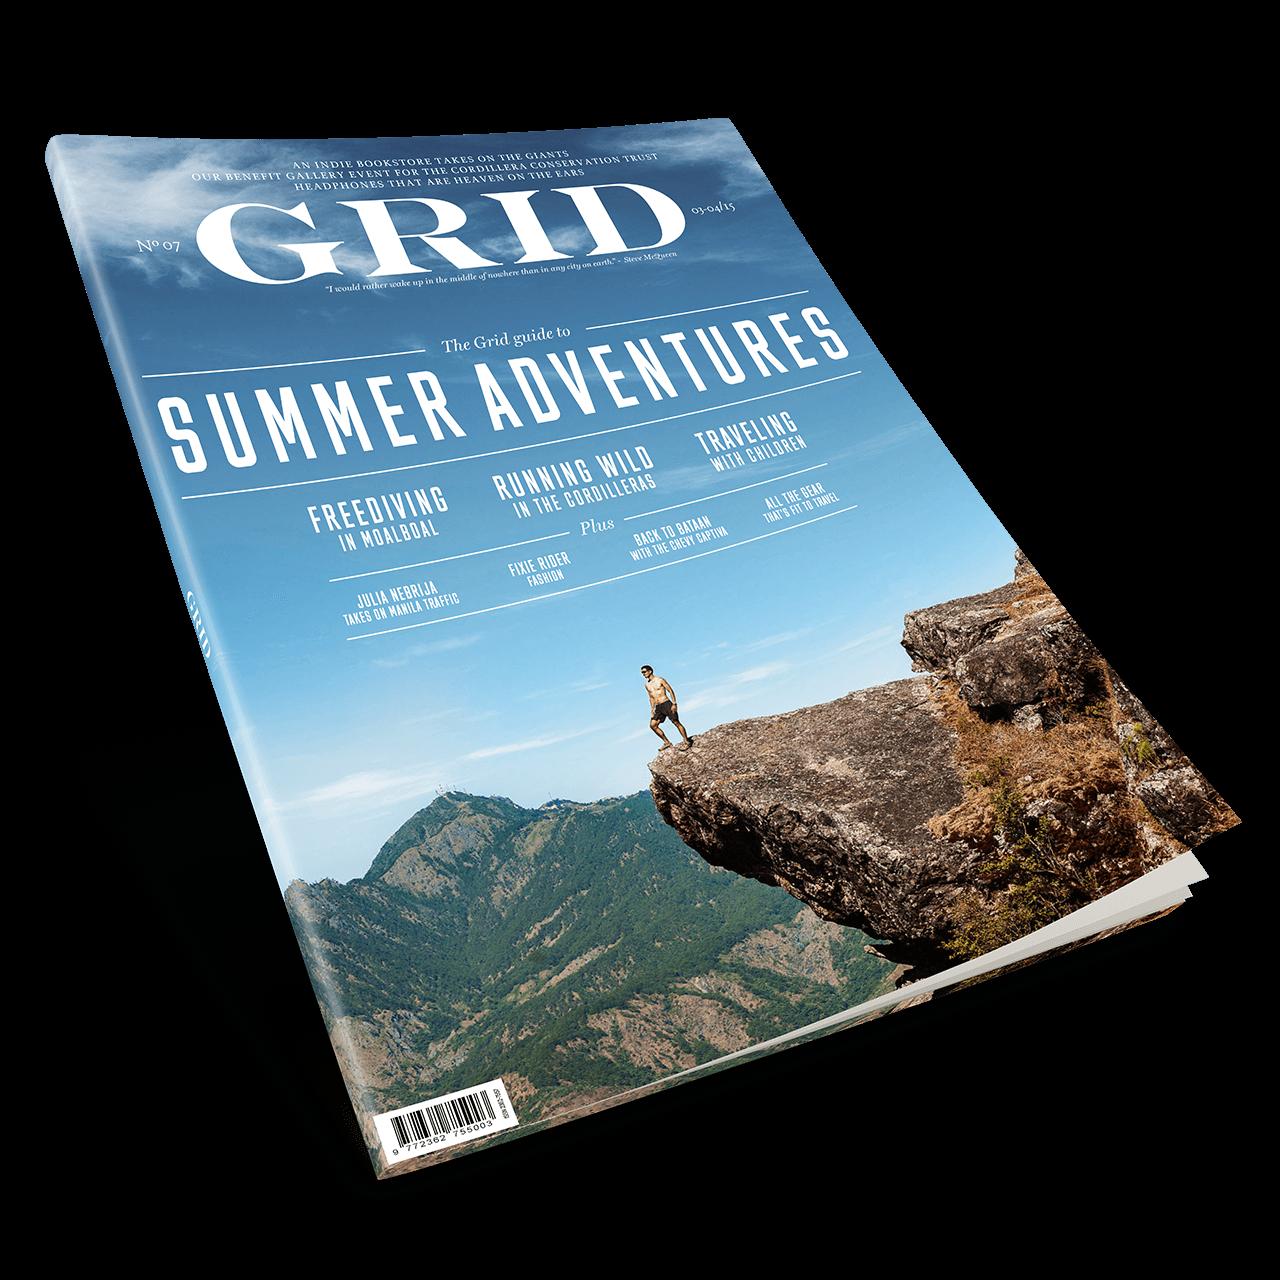 Issue 07 | Summer Adventures